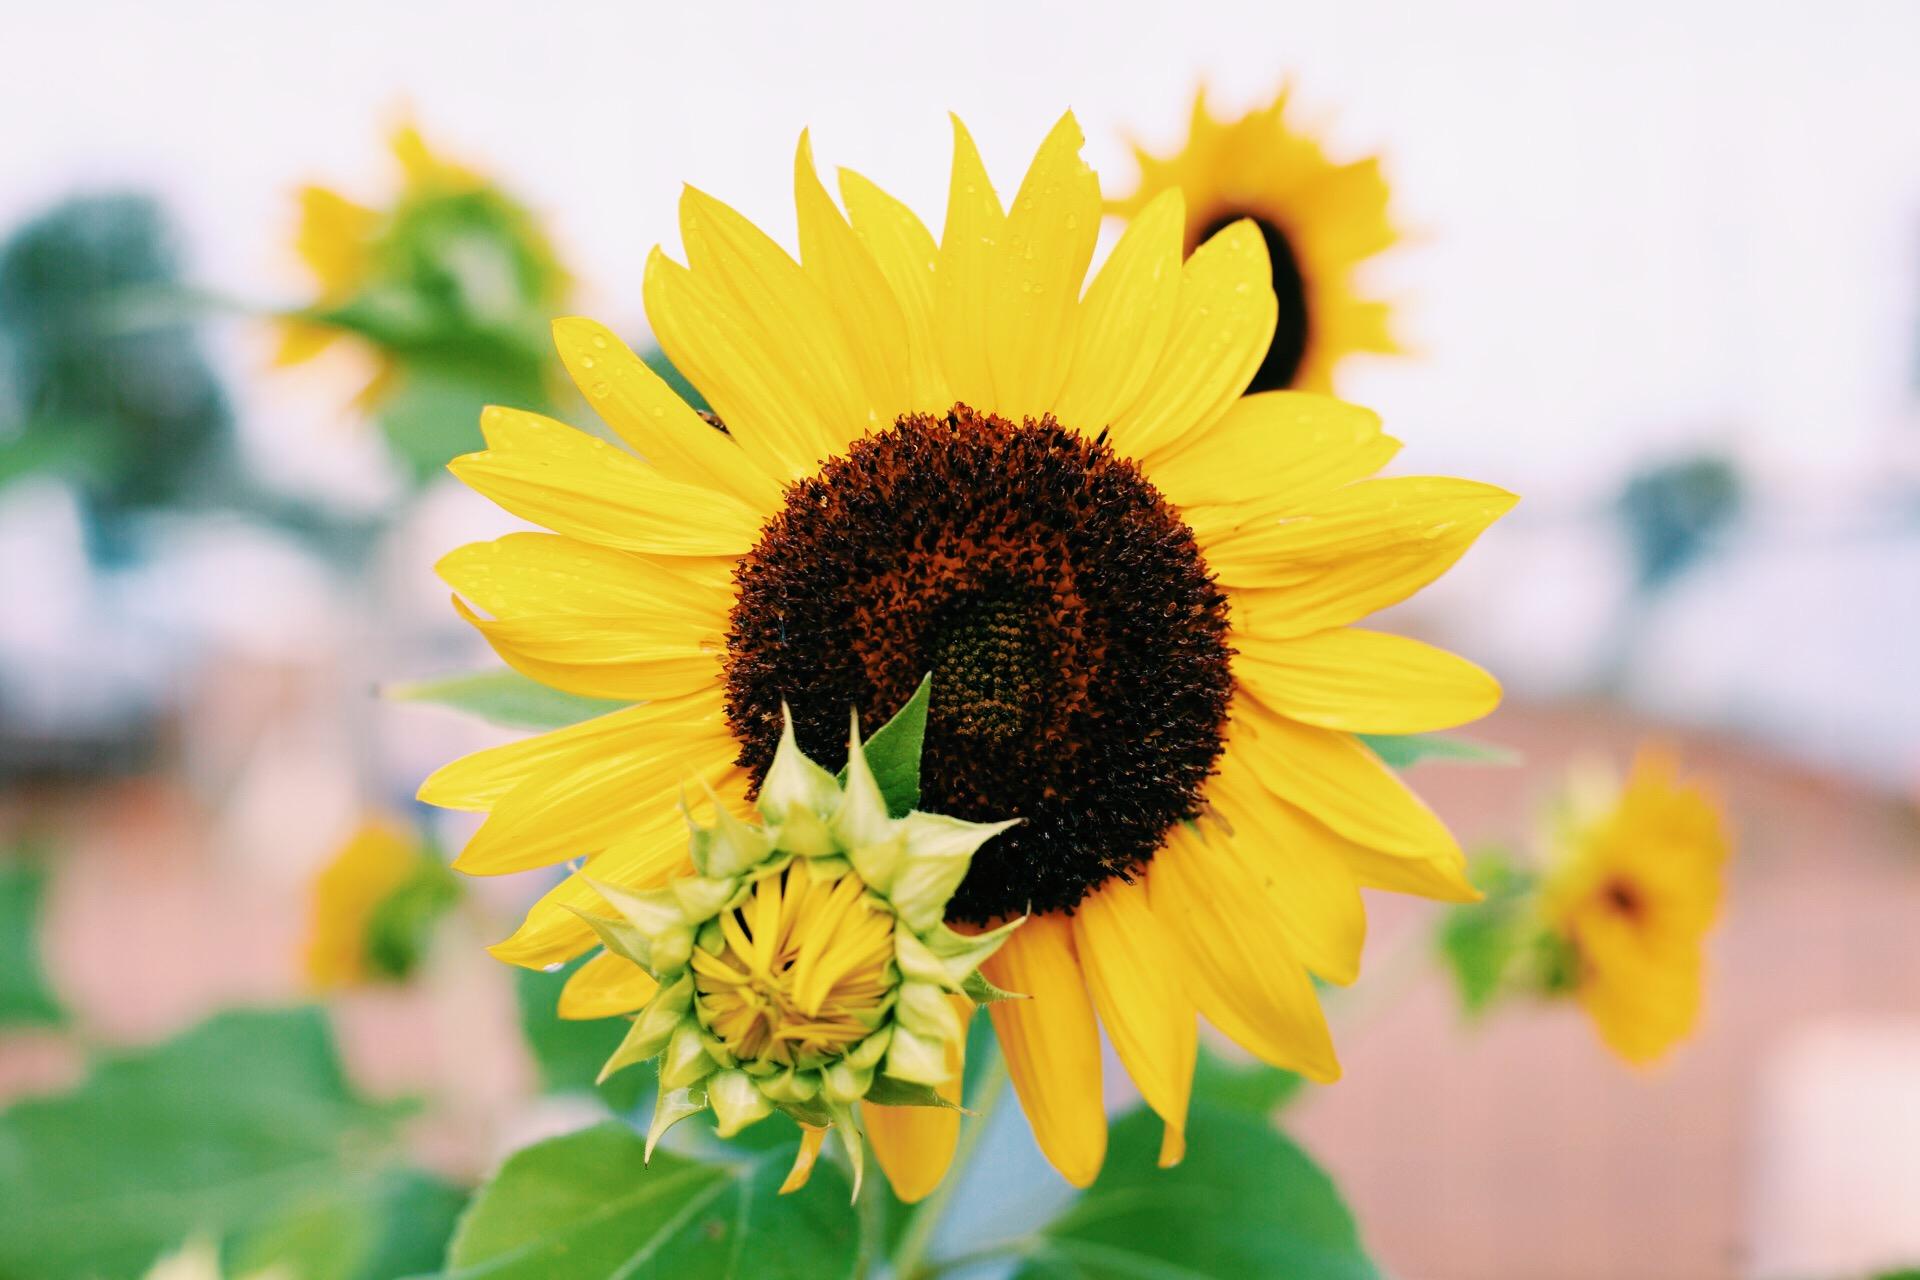 Agriculture sunflower.JPG